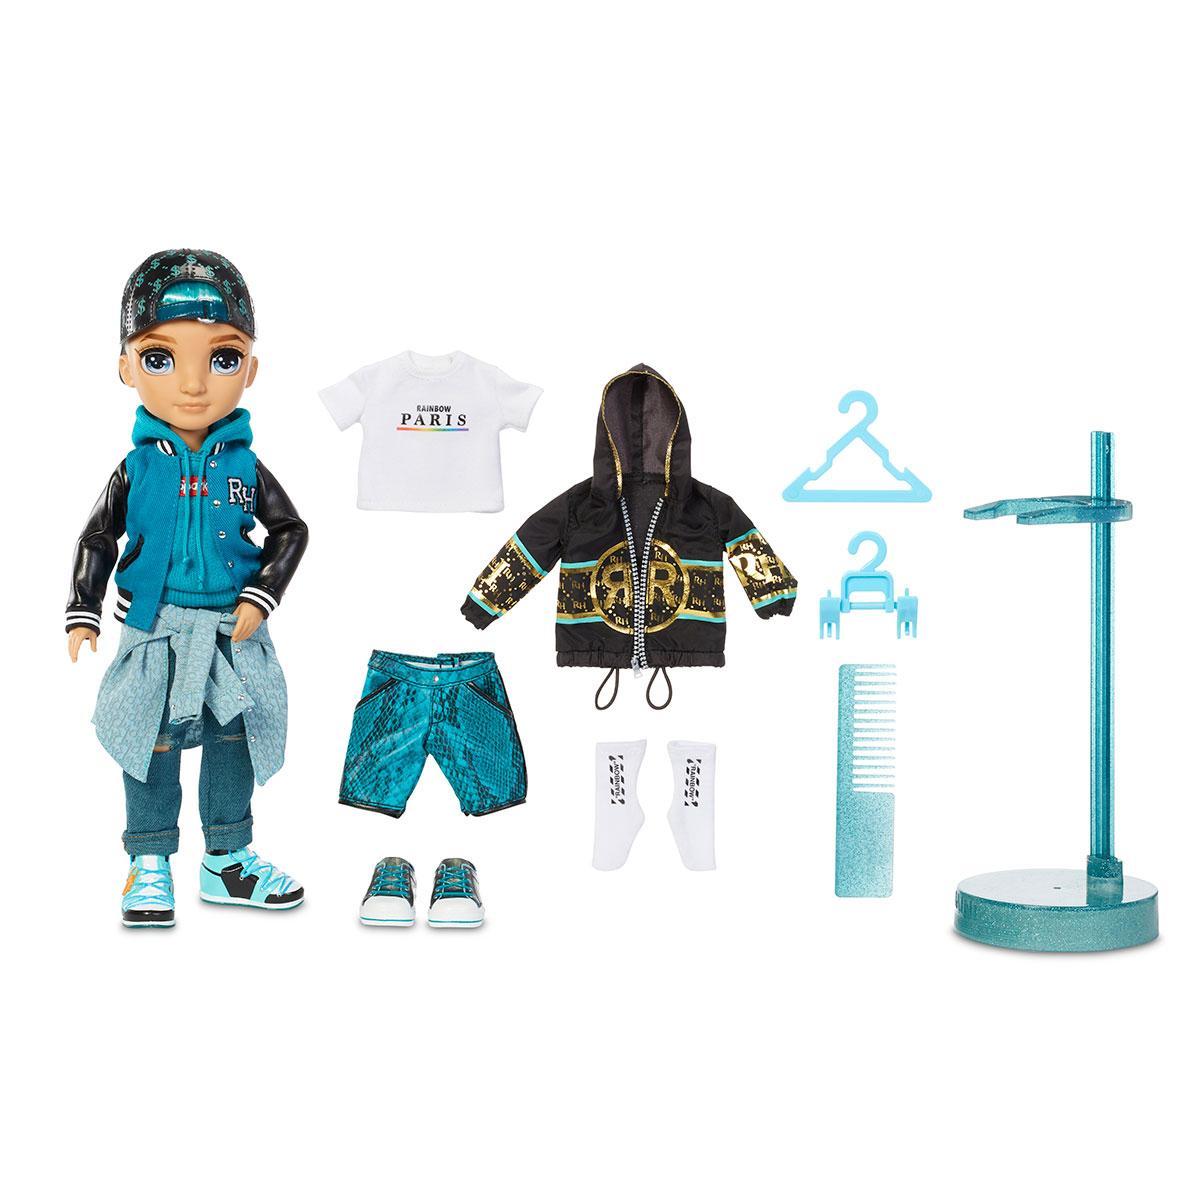 Кукла Рейнбоу Хай серия 2 Ривер Кендалл Rainbow High S2 River Kendall Fashion Doll 572145